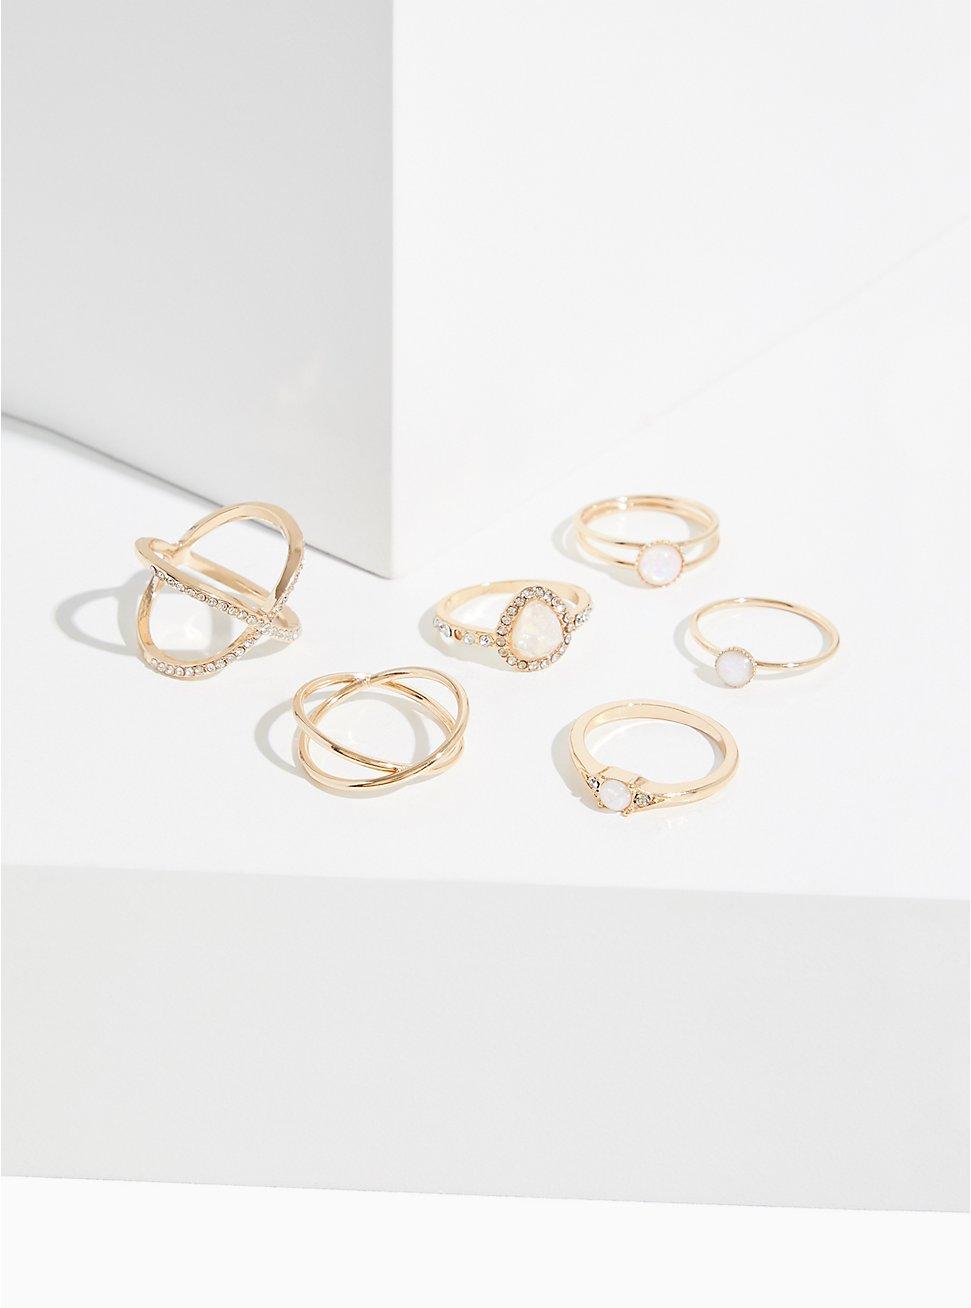 Gold-Tone Faux Opal Teardrop Ring Set - Set of 6, , hi-res